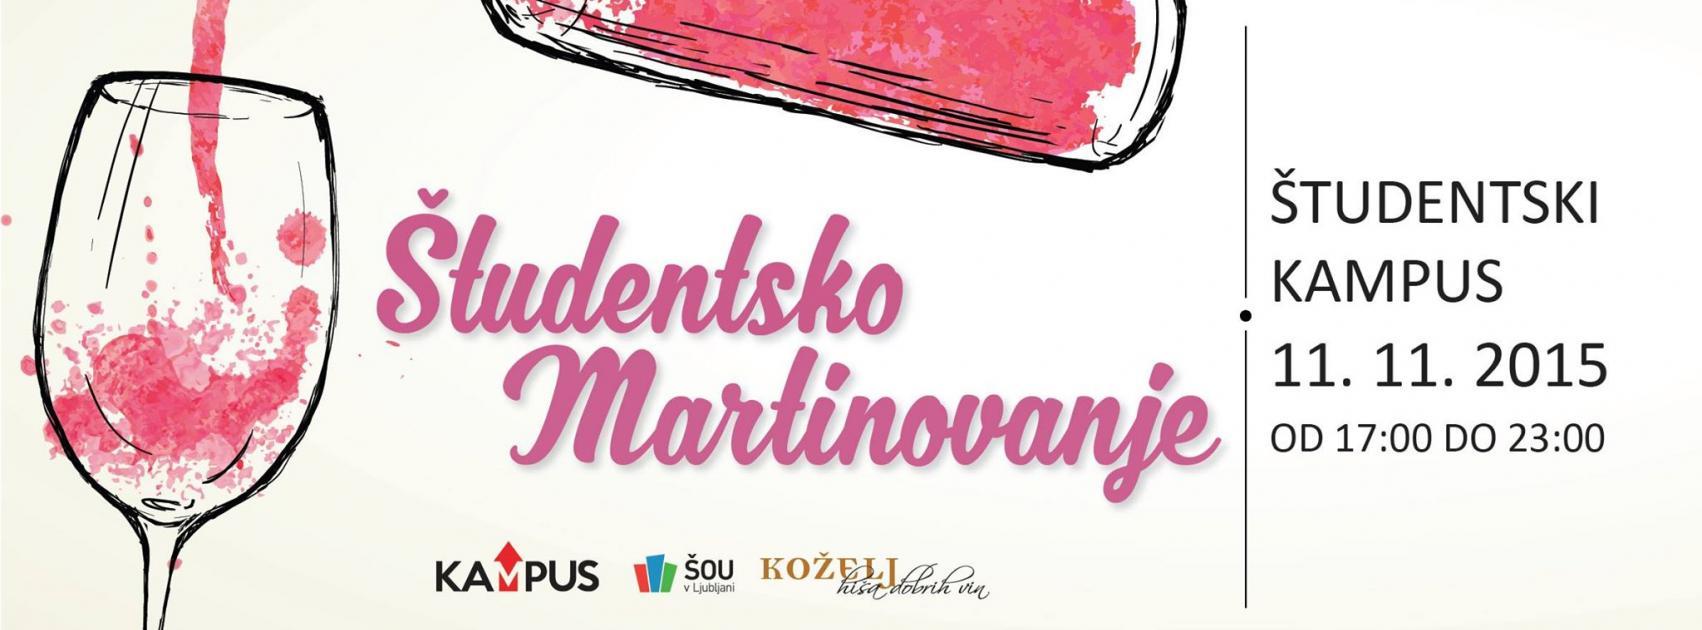 martinovanje_cover.jpg